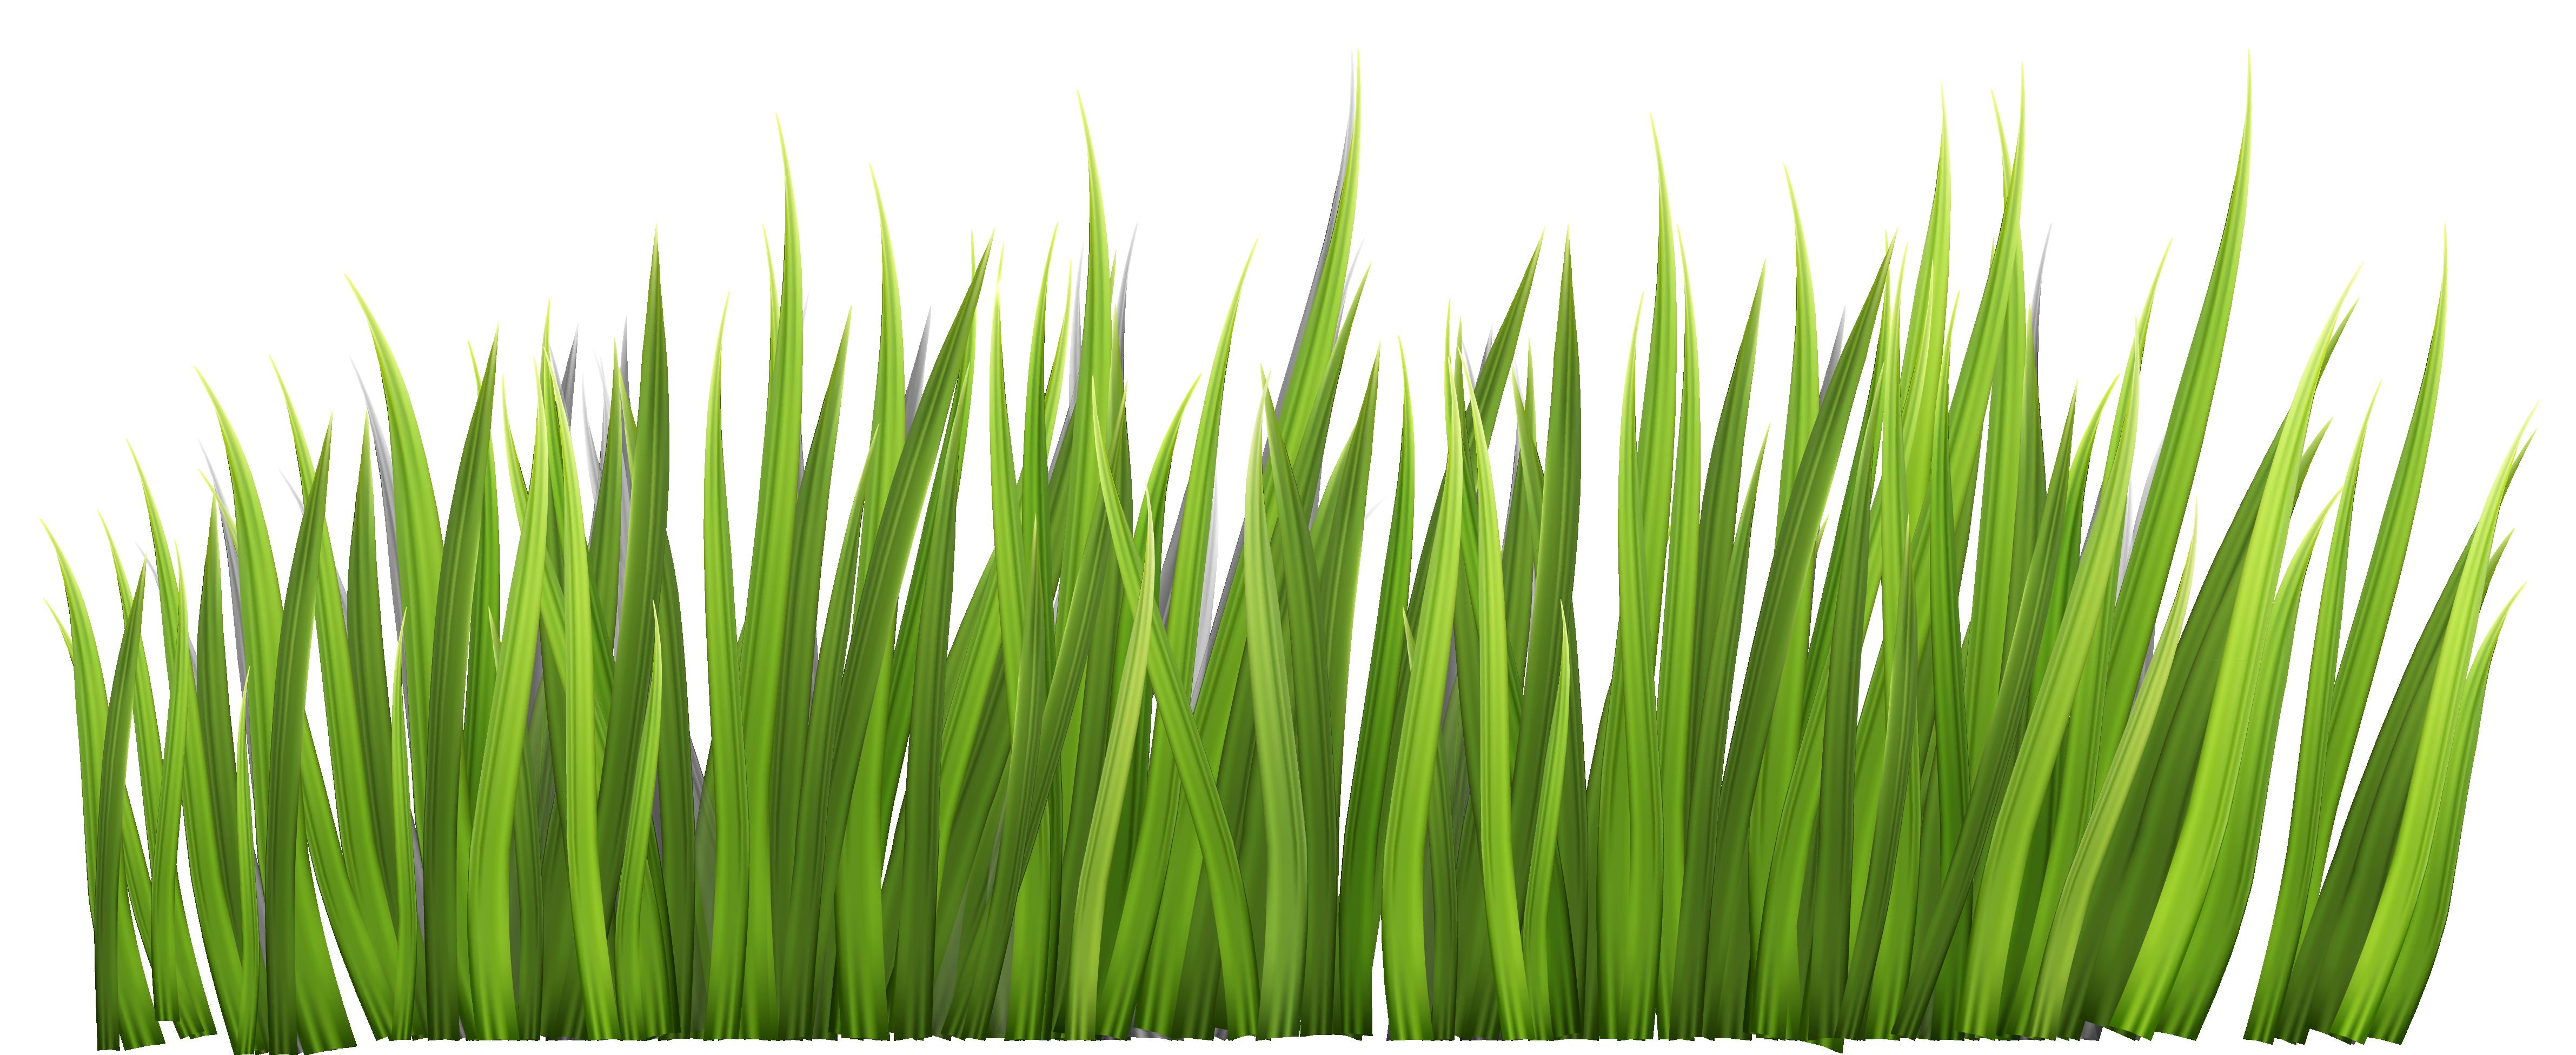 Safari Grass Clipart #1